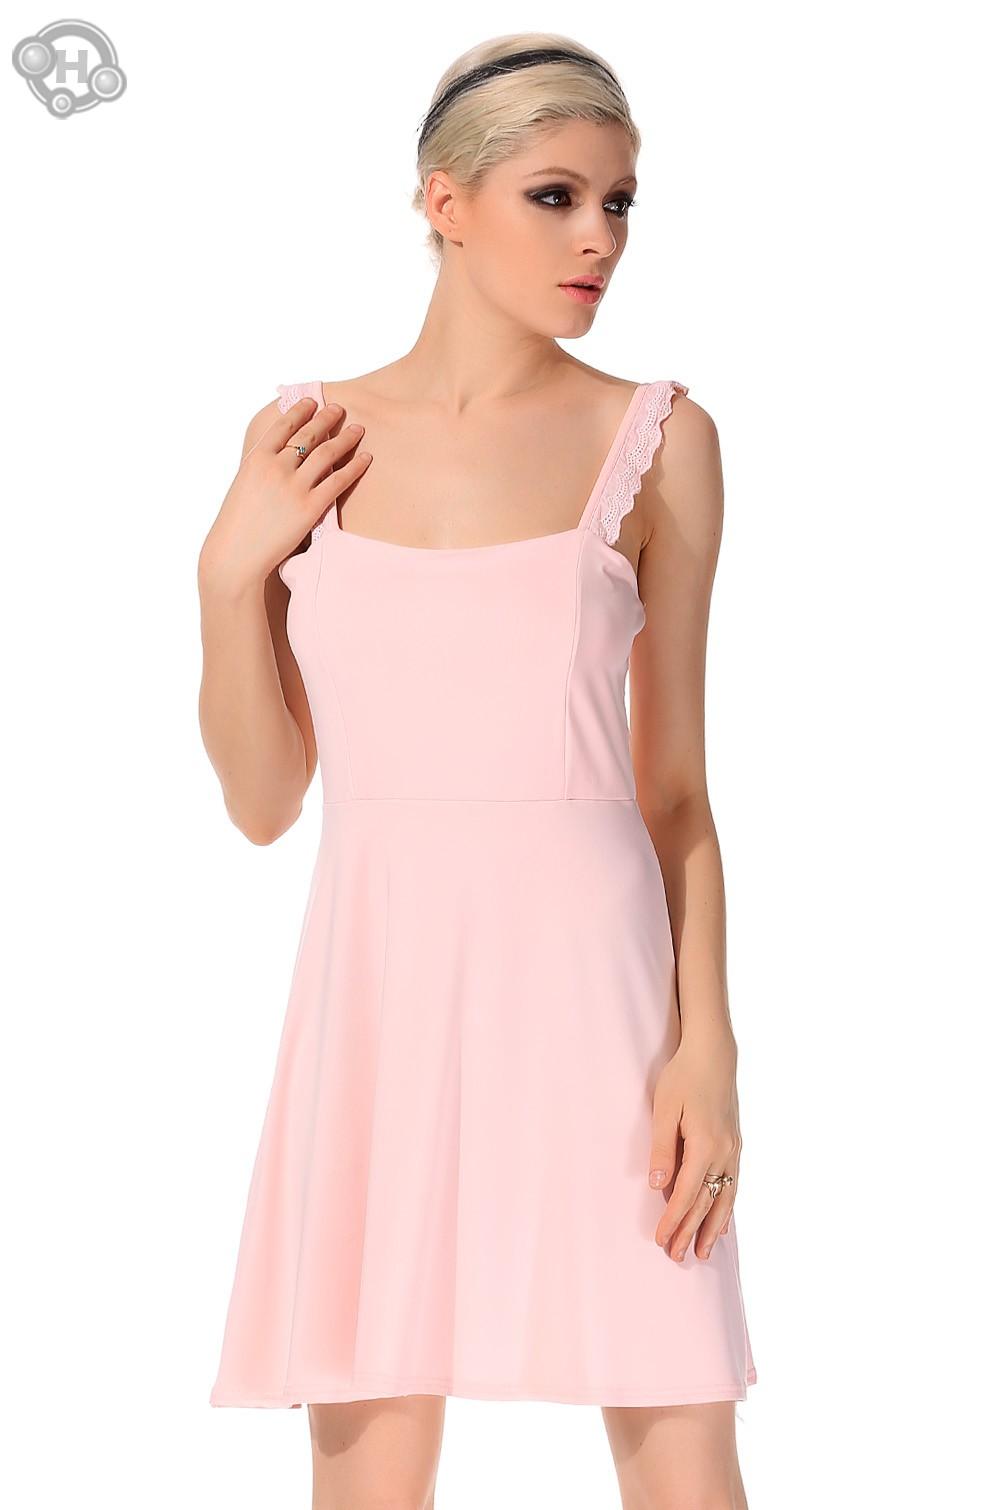 5b460b5ff Get Quotations · Fashion Ladies' High Waist Elegant Dress Sexy Sleeveless  Backless Spaghetti Strap Causal Slim Mini A